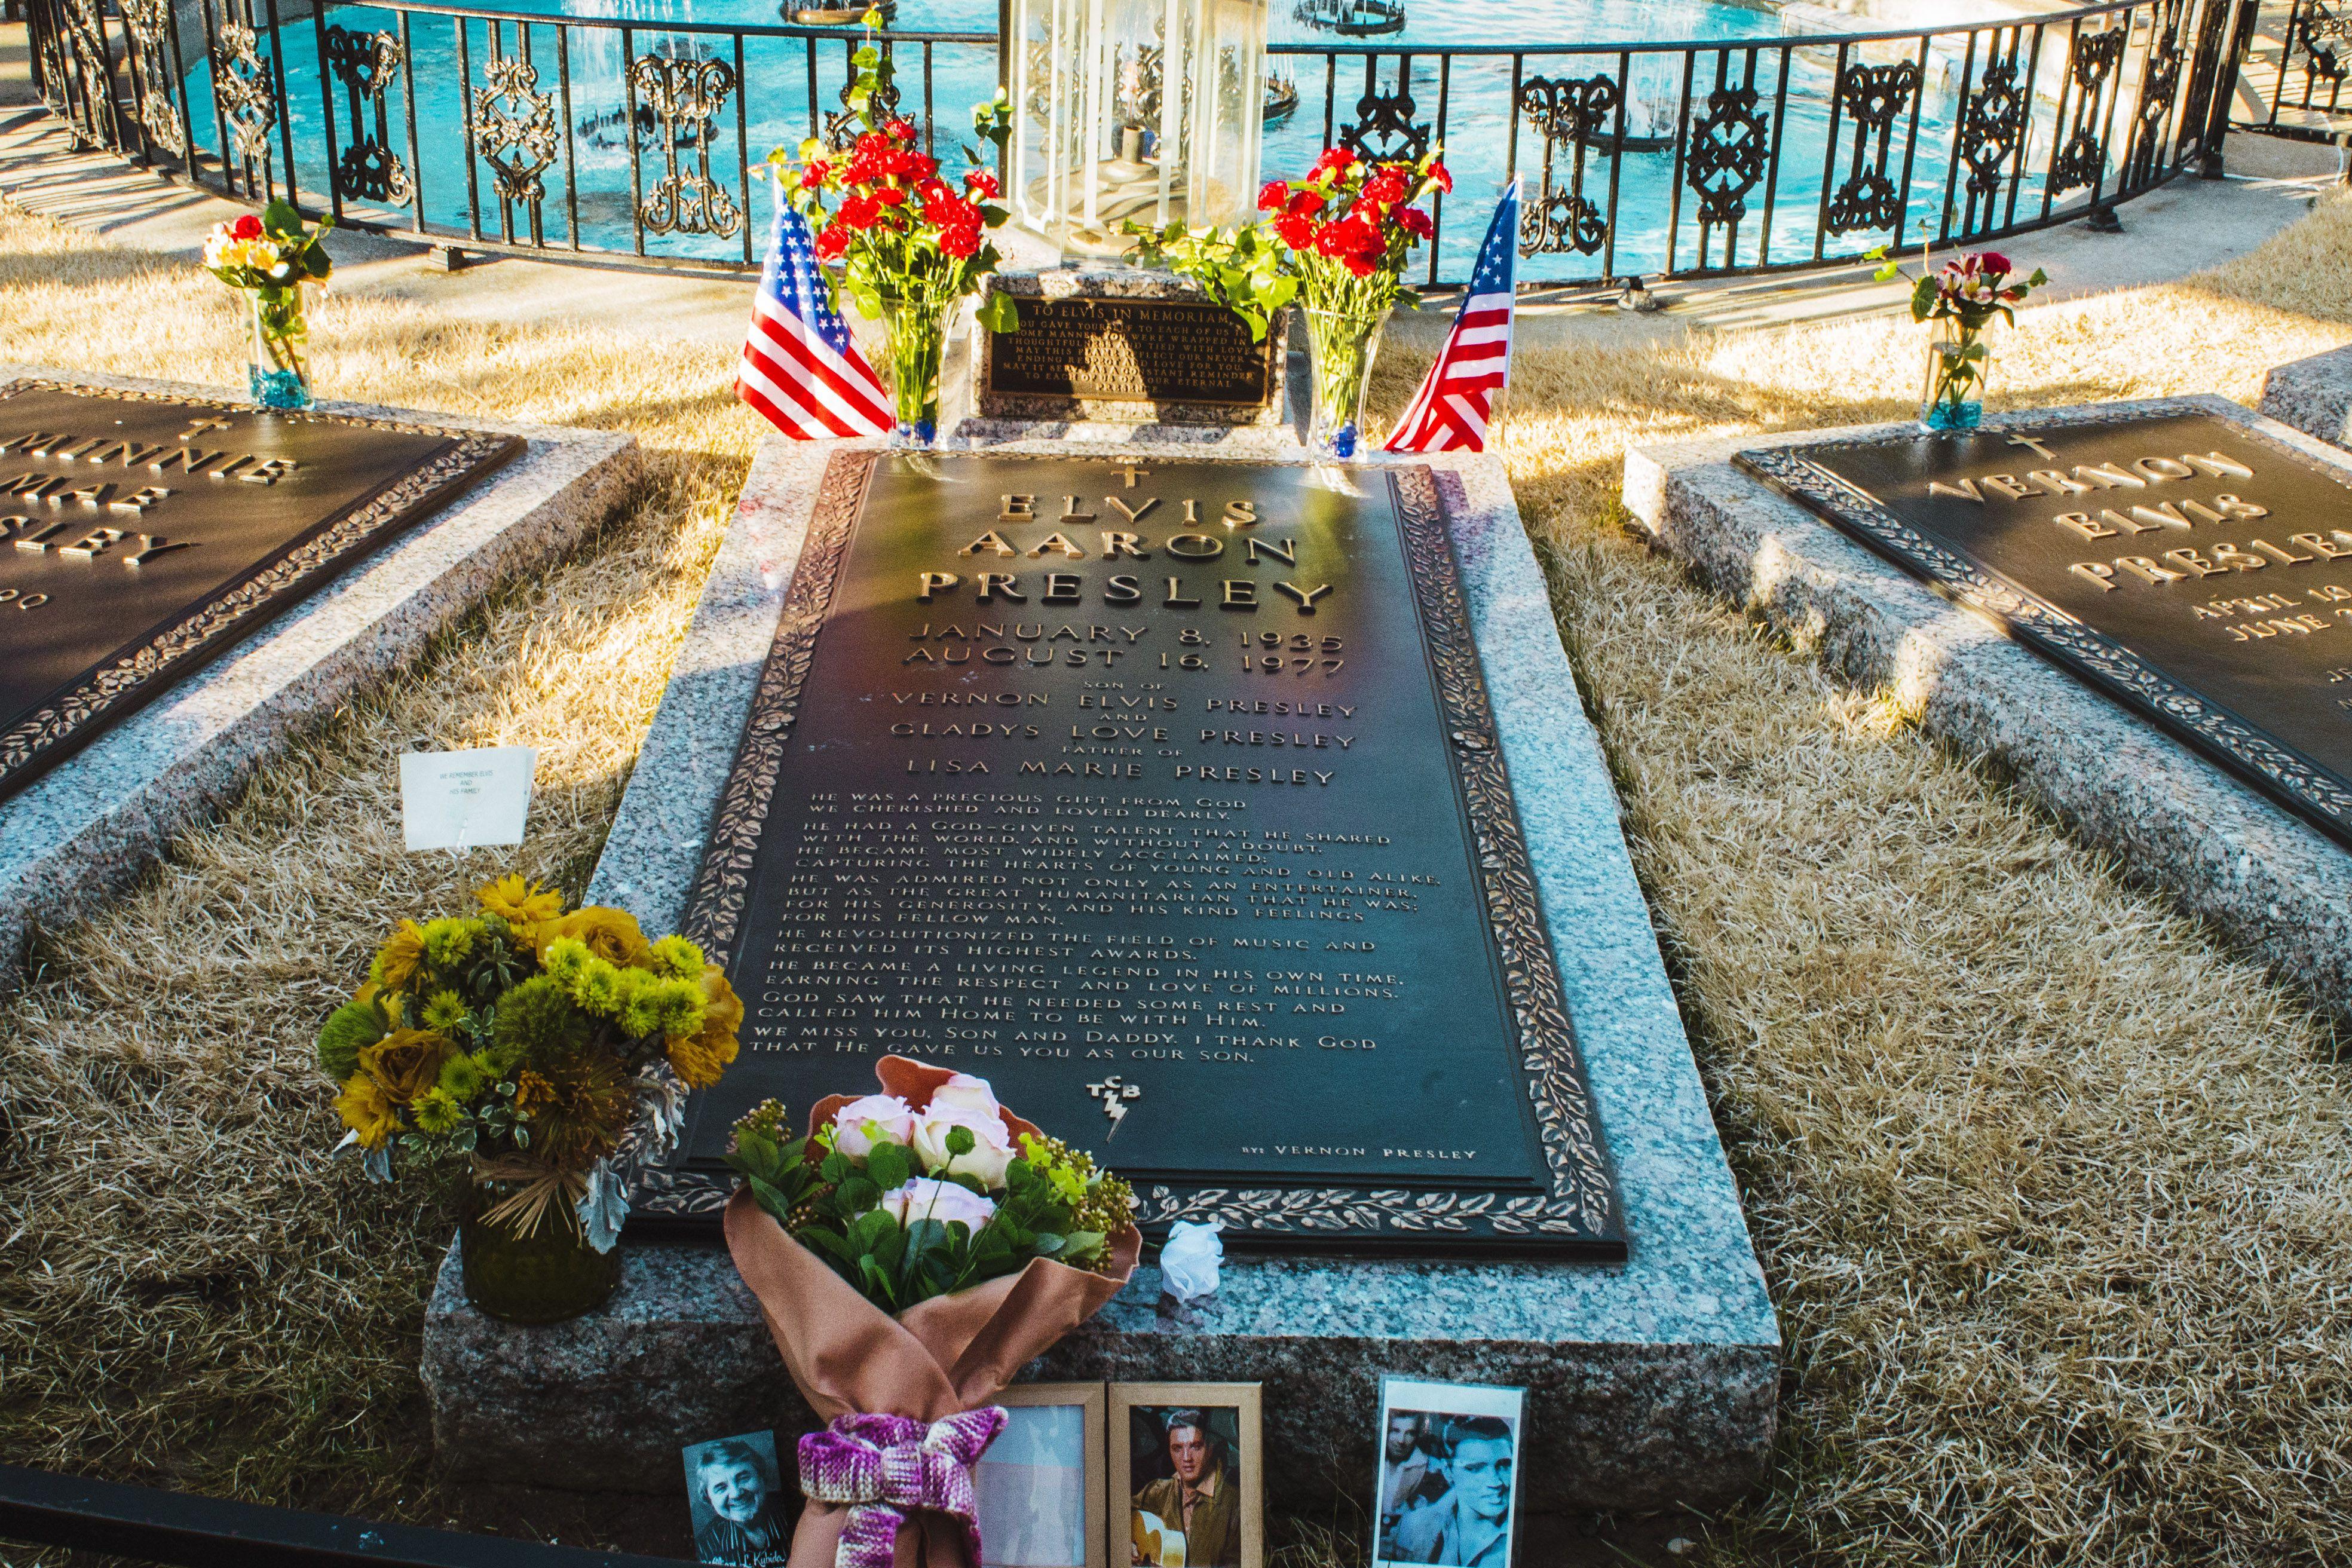 Elvis' grave in Memphis